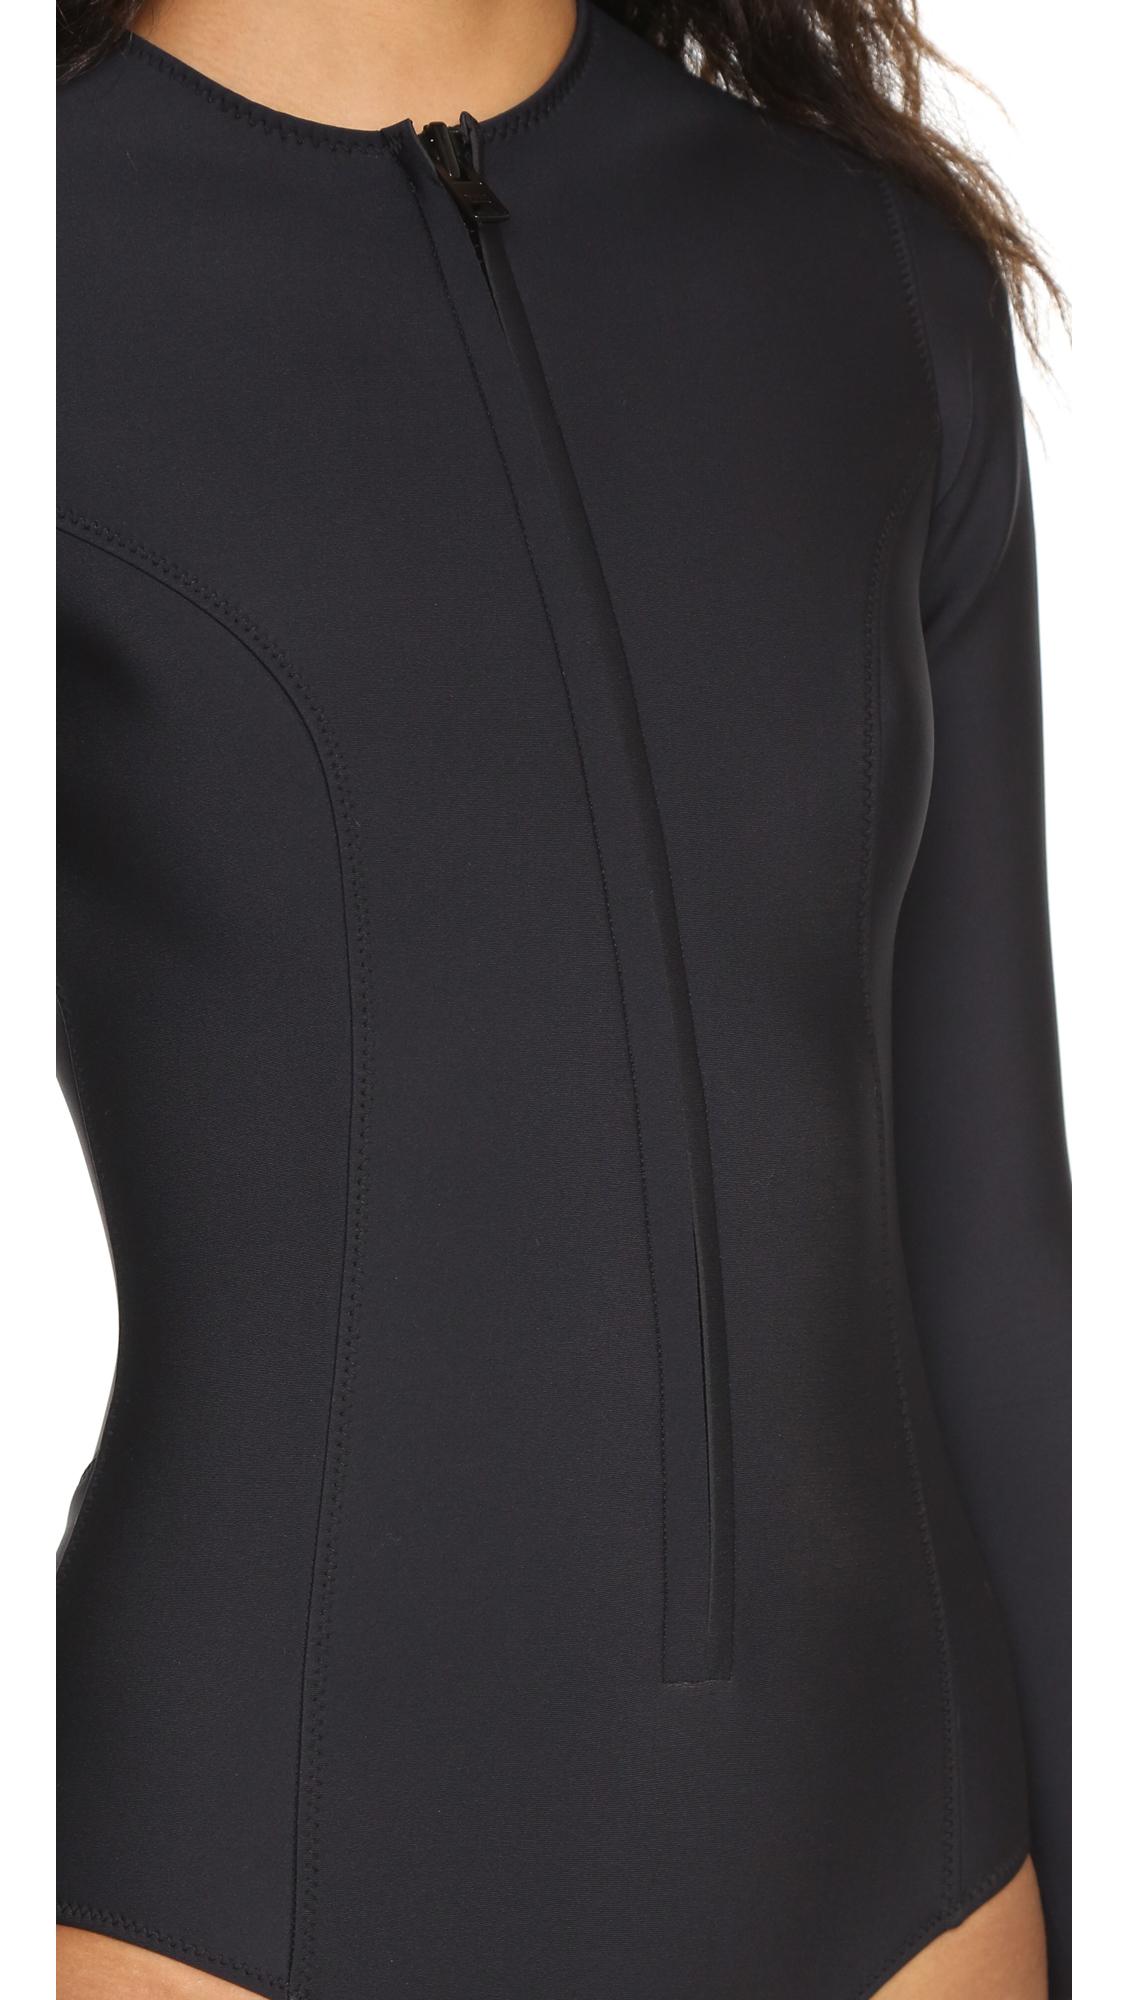 lyst lisa marie fernandez farrah long neoprene maillot in black. Black Bedroom Furniture Sets. Home Design Ideas